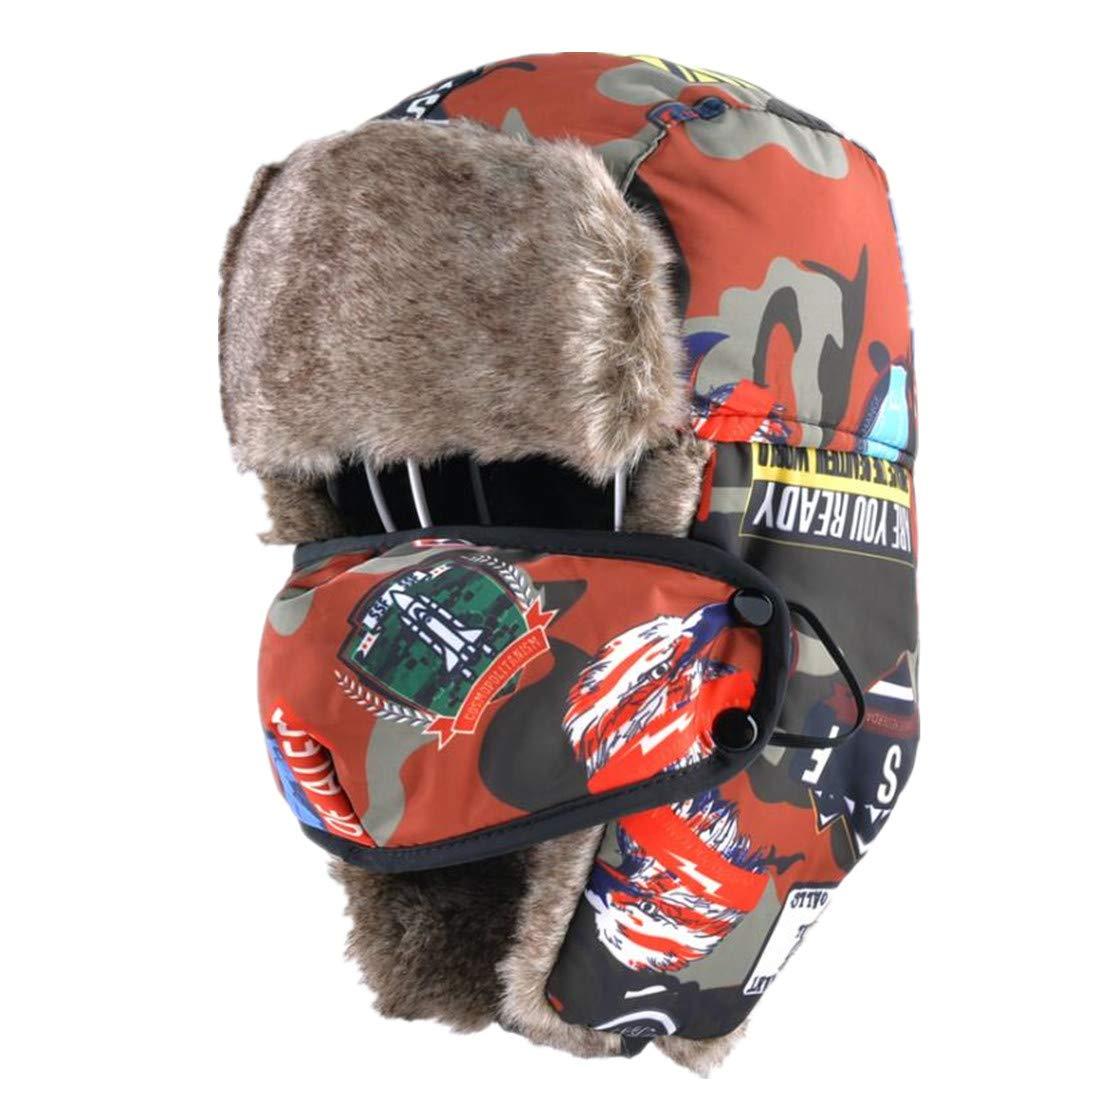 Unisex Bomber Hats for Winter Kids Outdoor Faux Fur Thick Caps Ear Flaps Warm Children Camo Trapper Hat